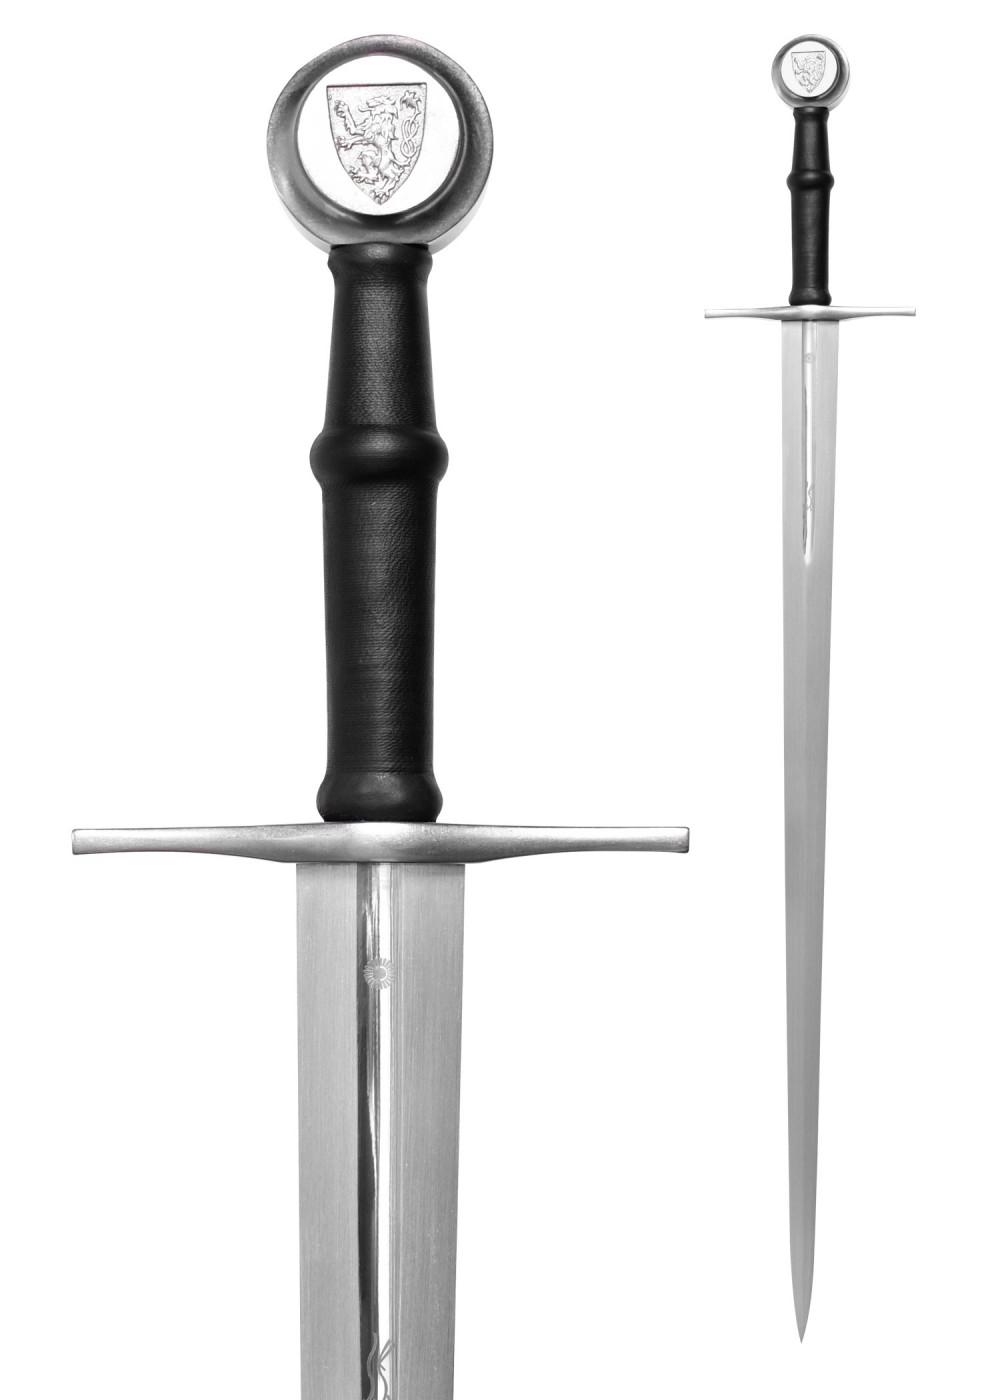 Eineinhalbhandschwert Schaukampfschwert Abb. Nr. 3